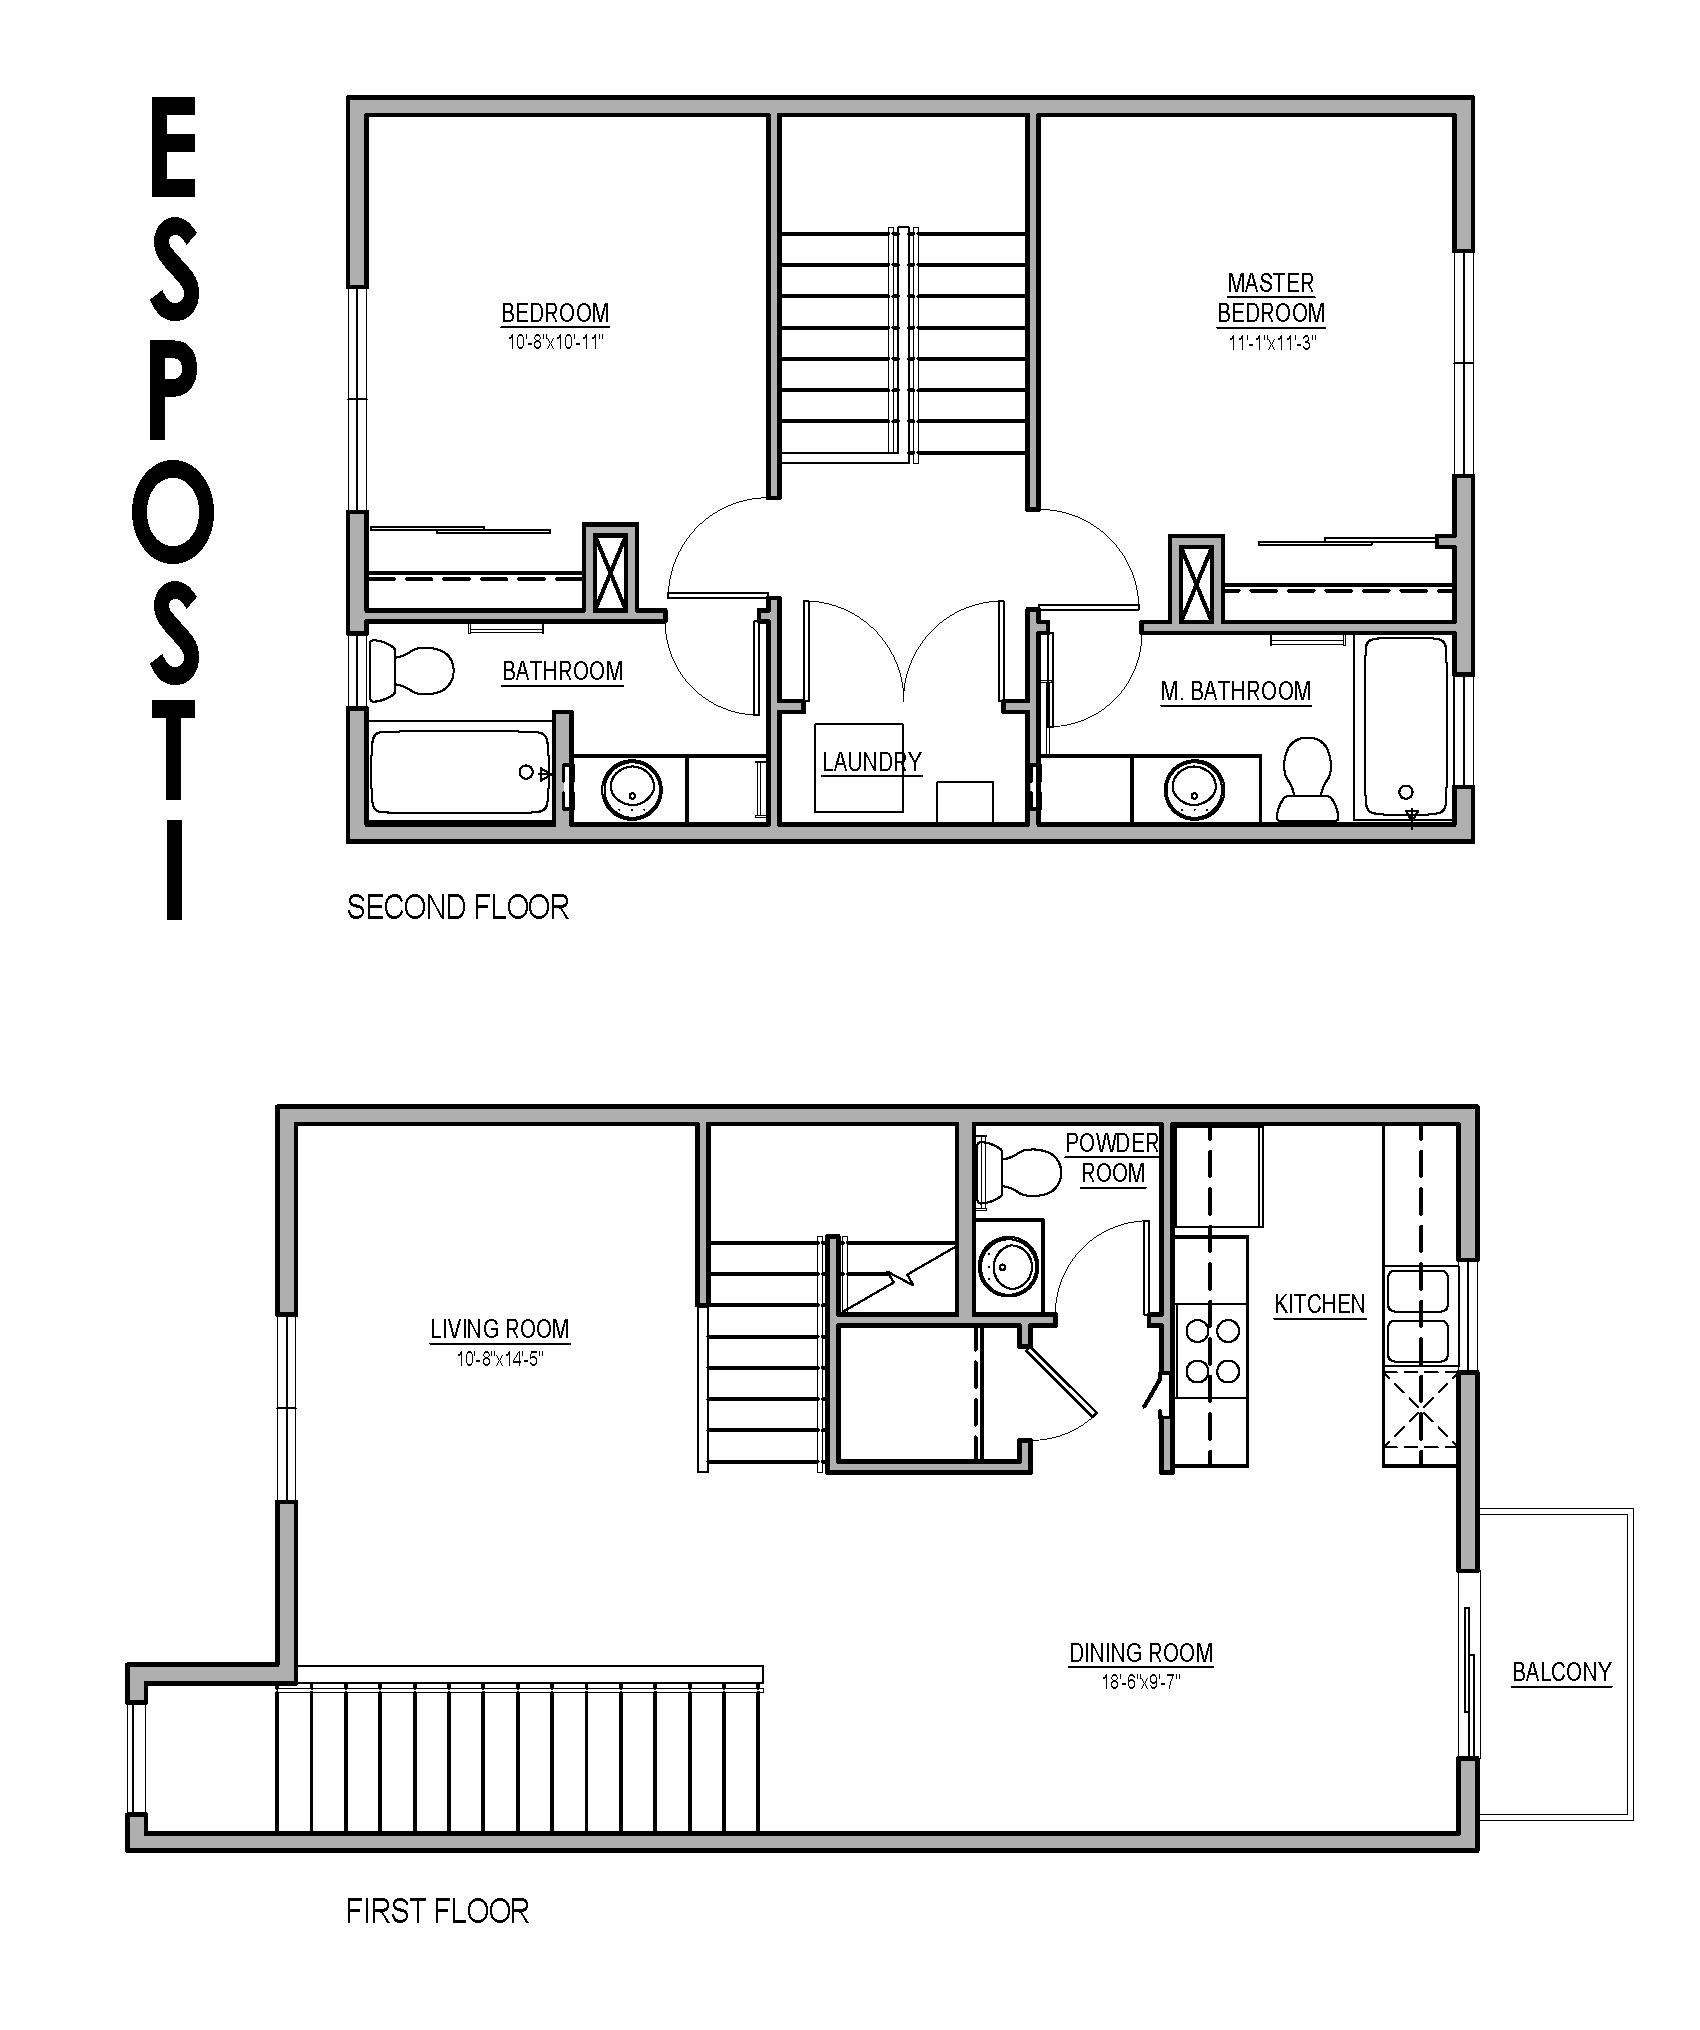 2 bedroom Townhouse Floorplan